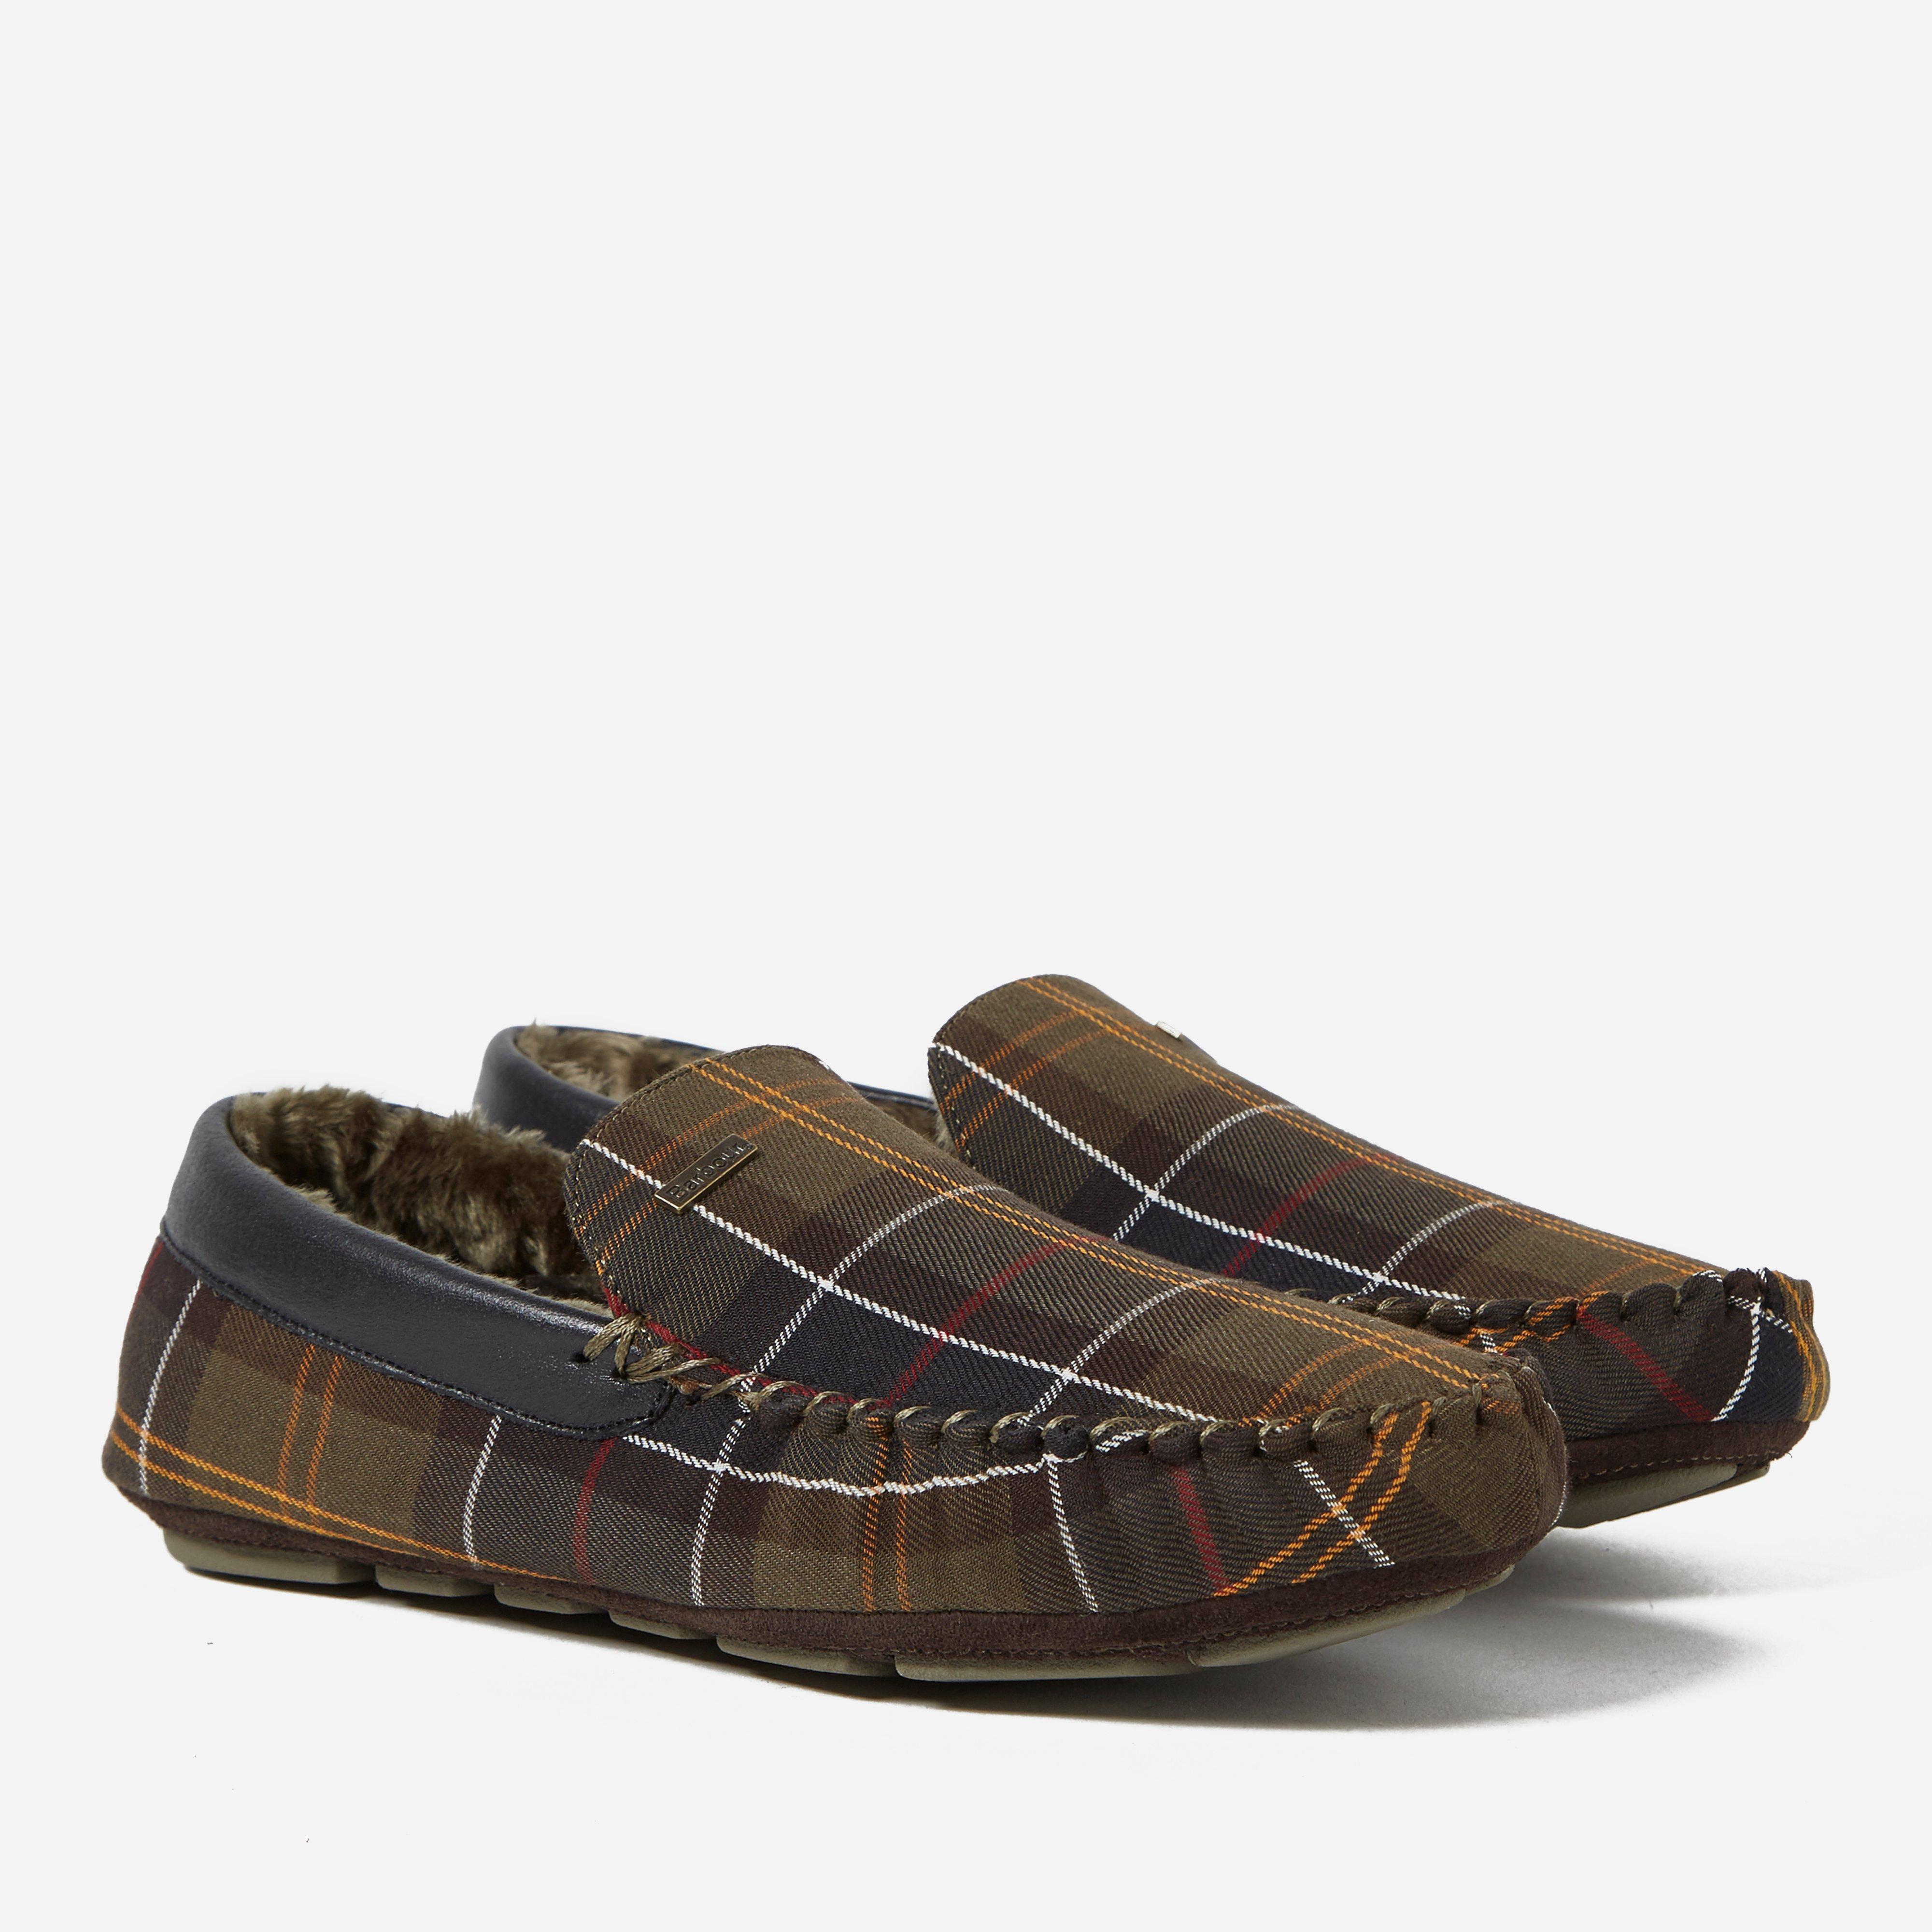 Barbour Classic Tartan Monty Slippers